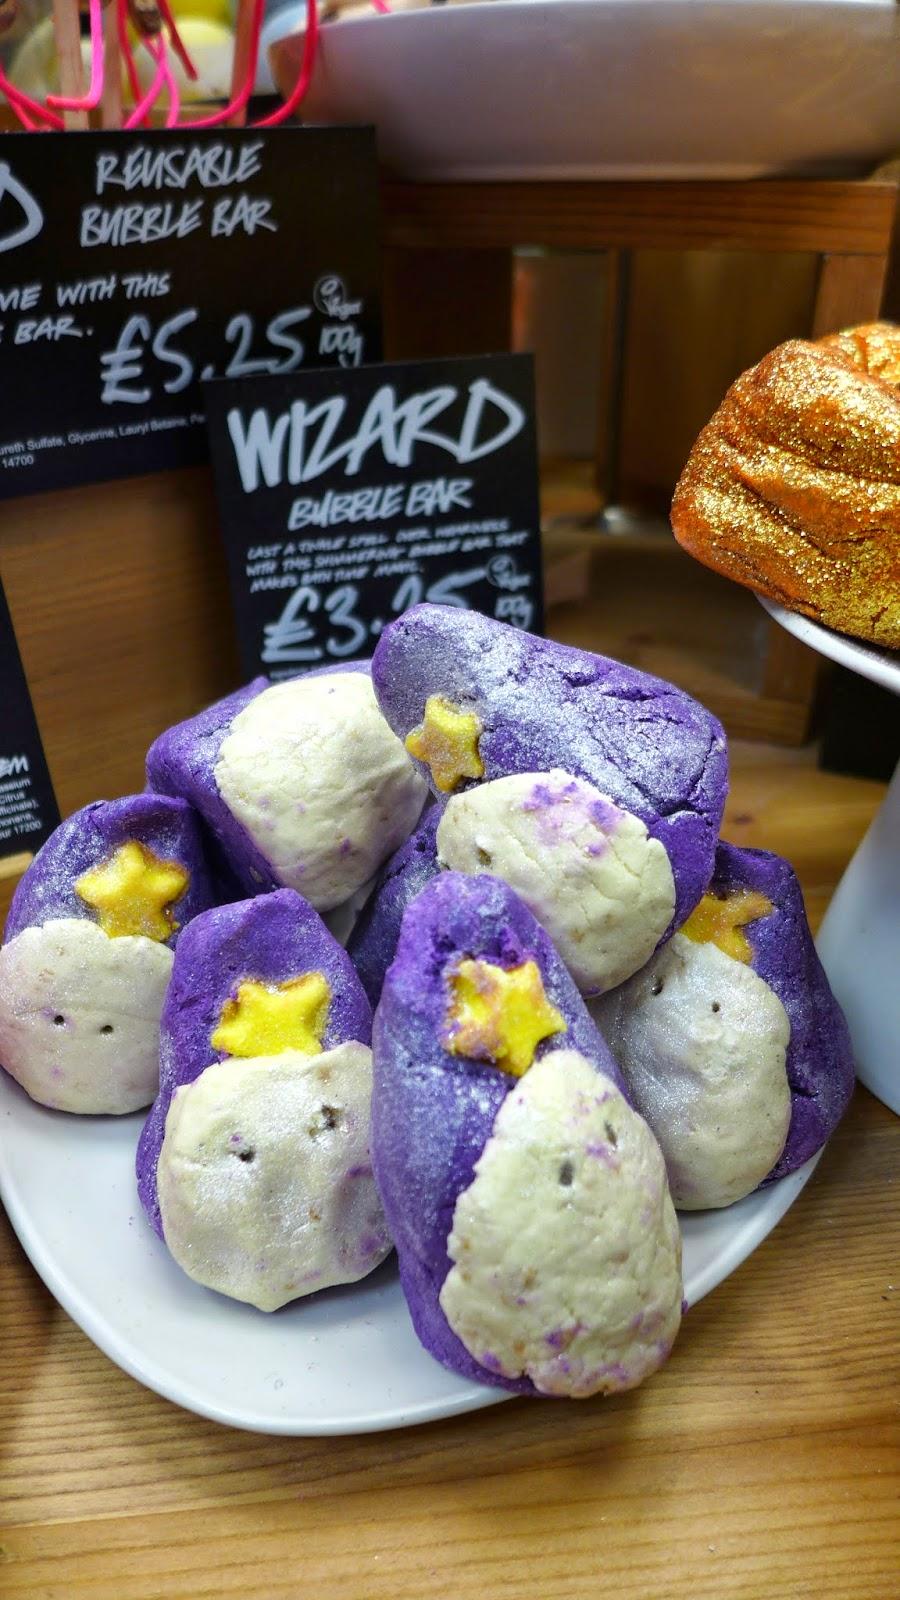 Wizard Bubble Bar